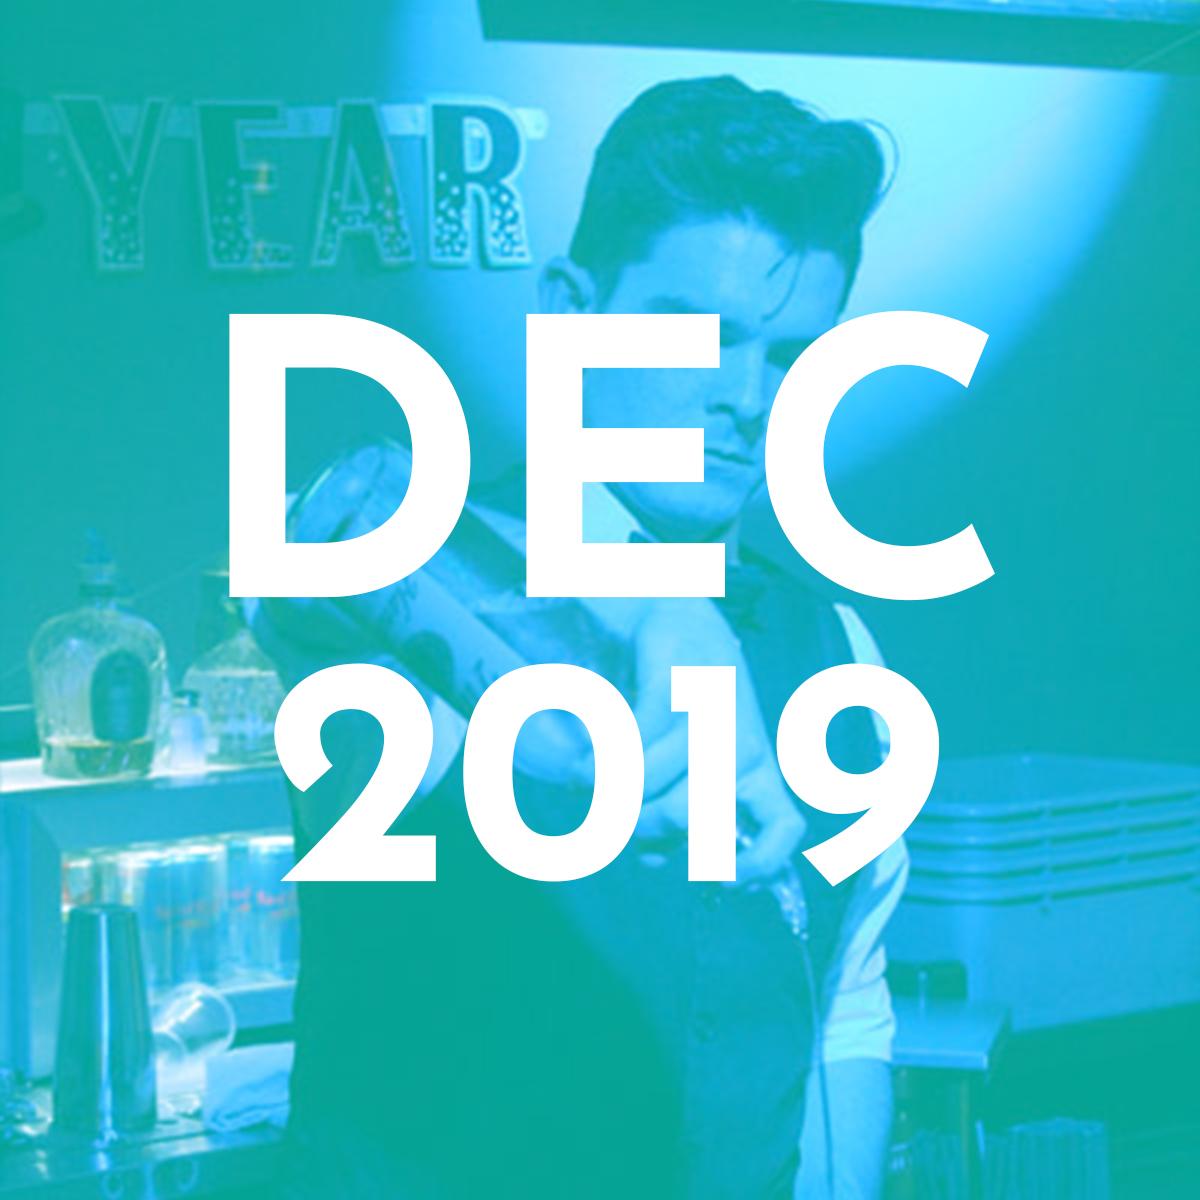 FACES GALLERY - December 2019